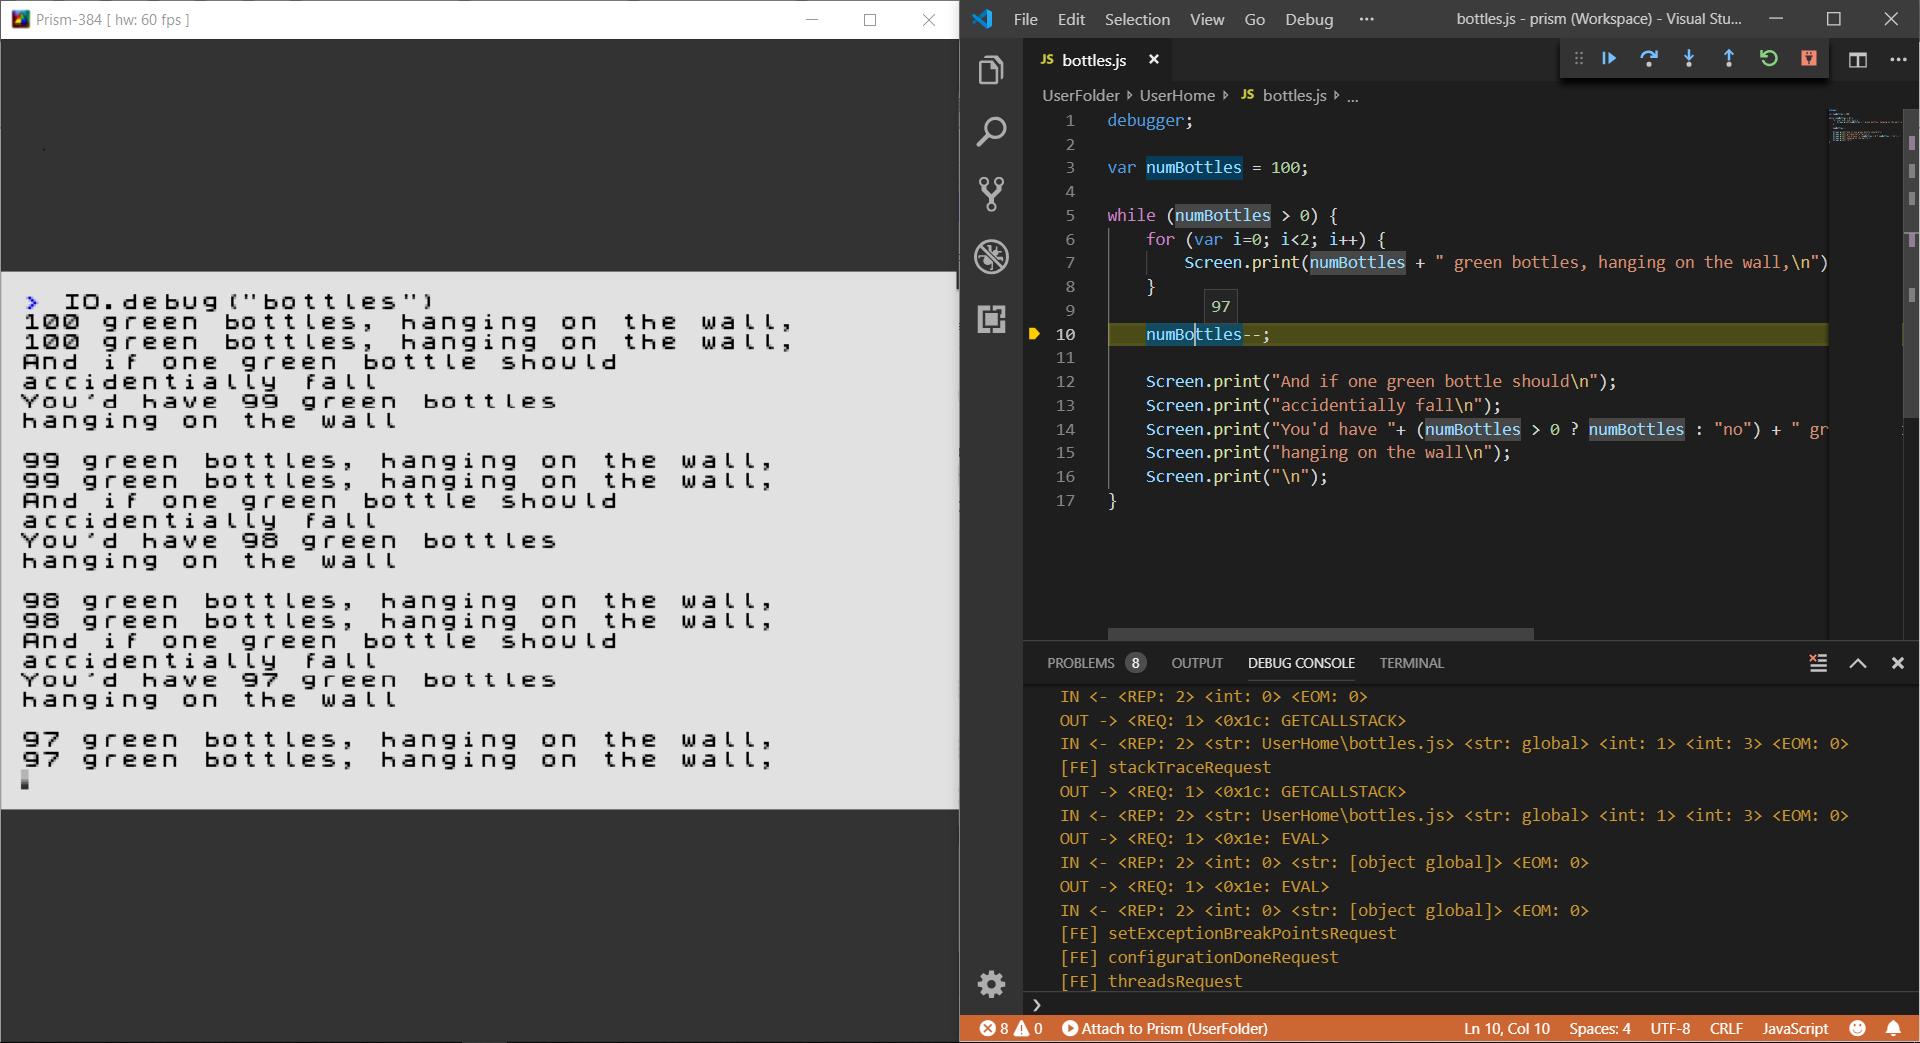 Build 2944 - Raspberry Pi and VS Code Debugging - Prism-384